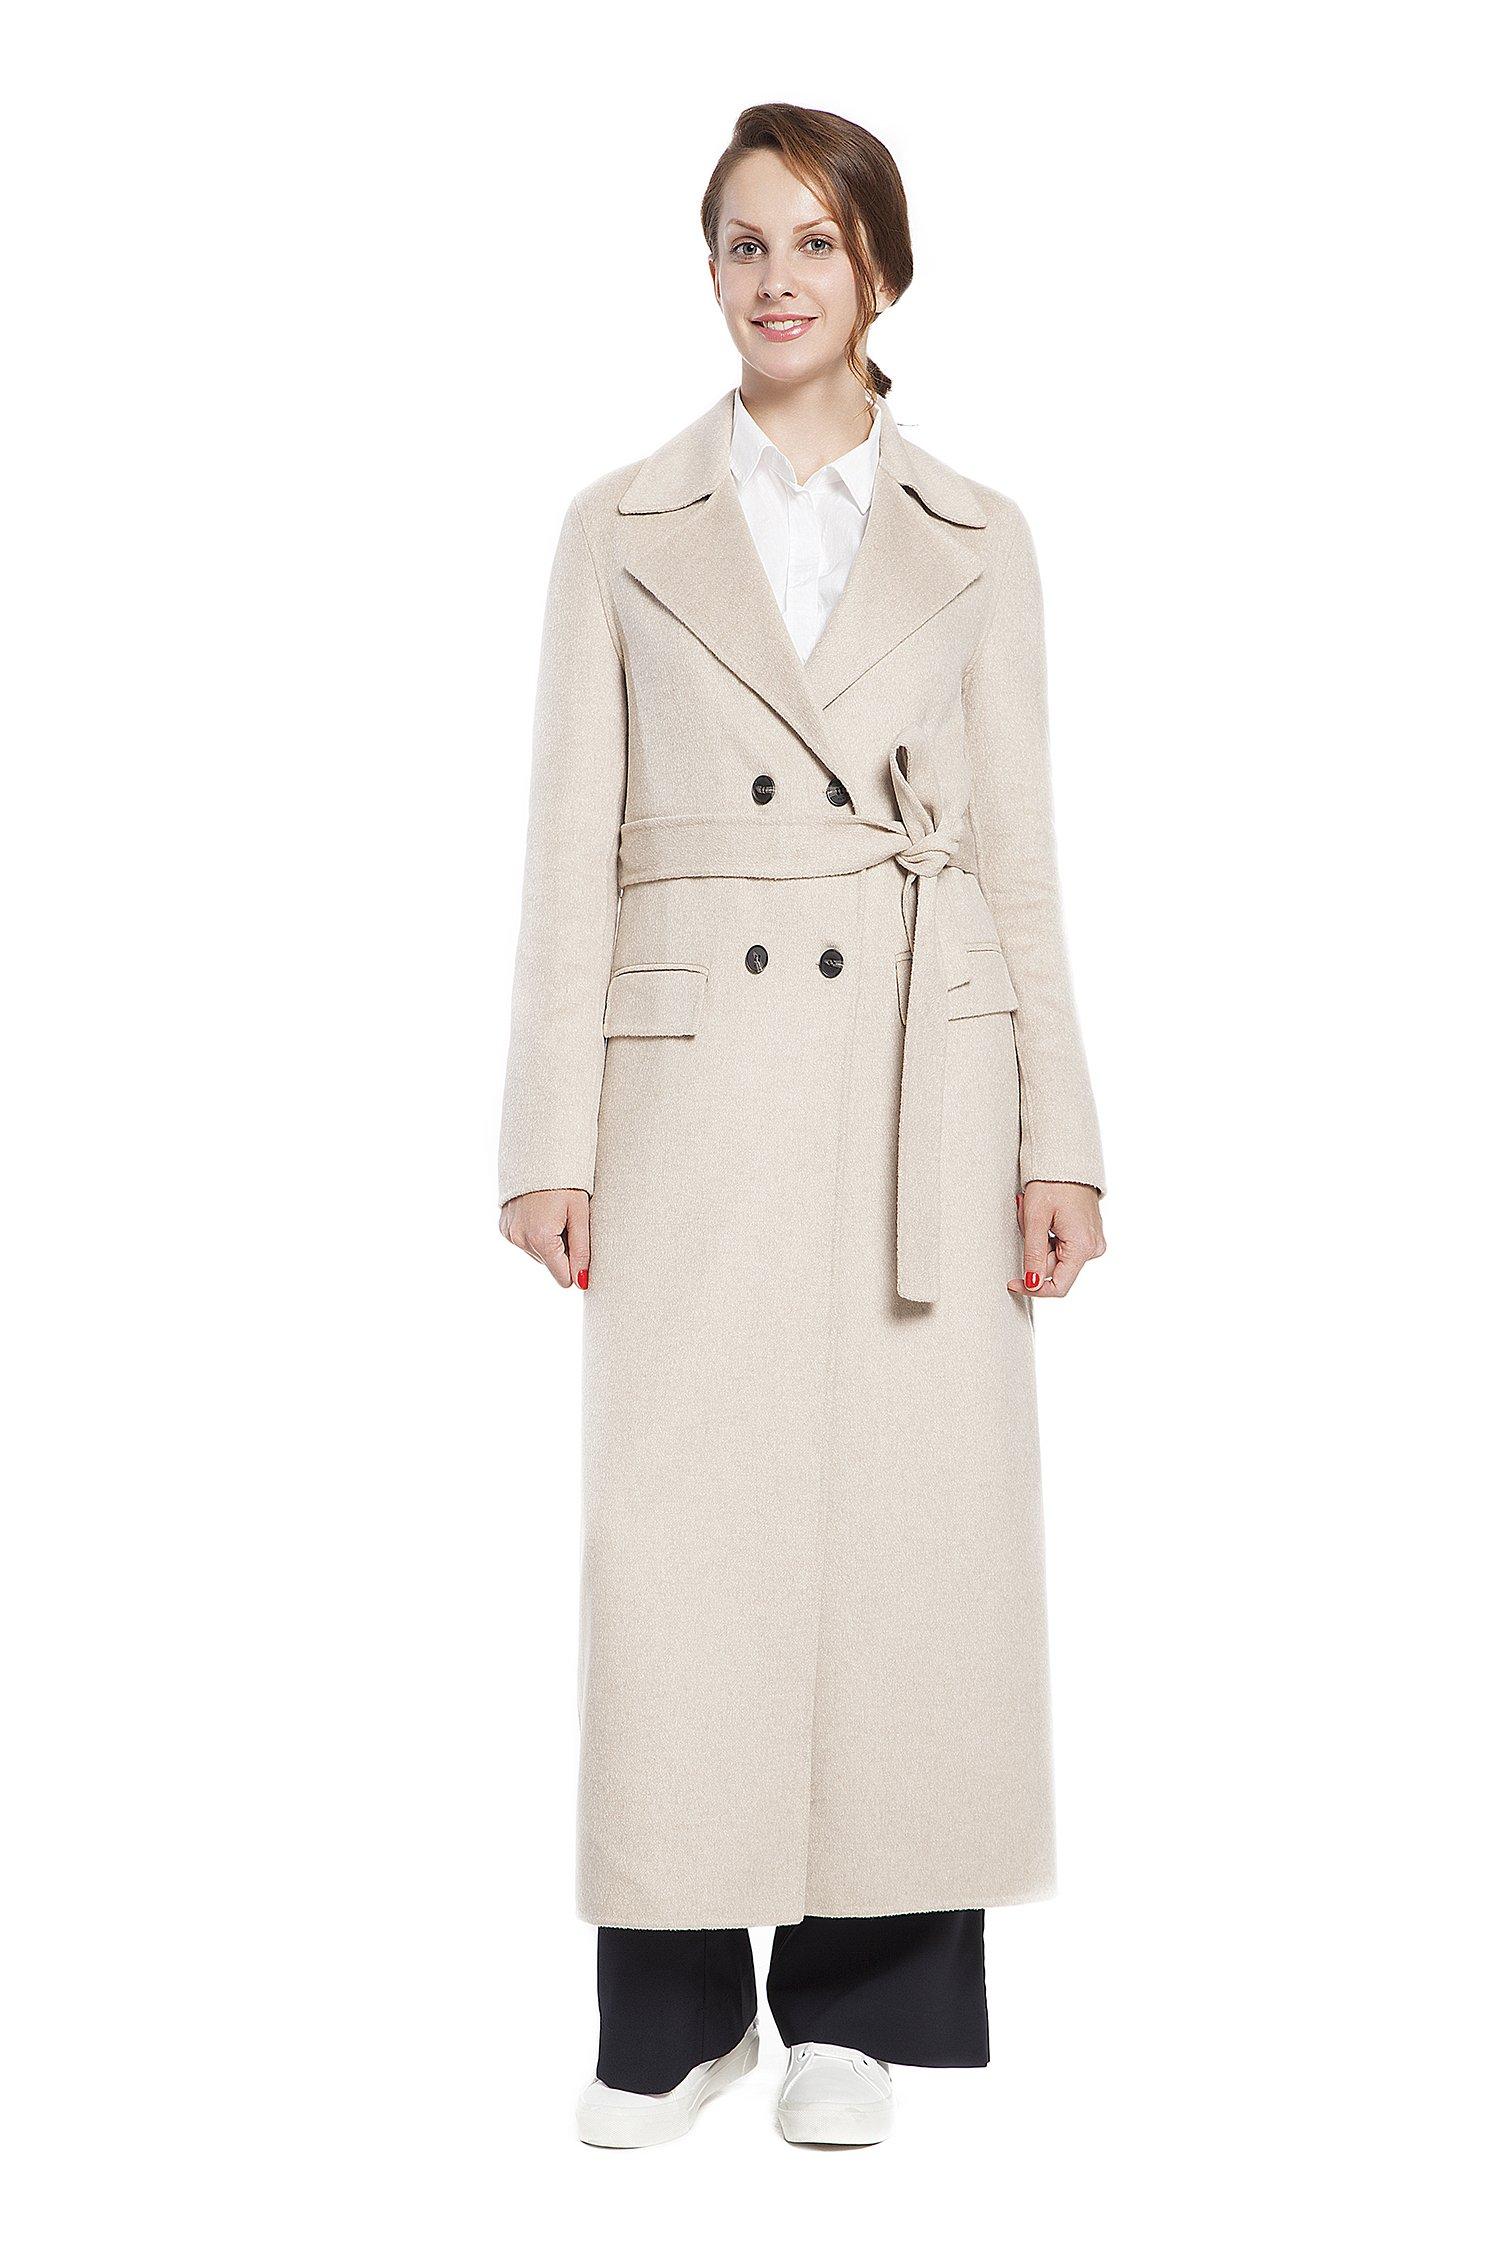 RLM Ladies Handmade Fashion Coat Woolen Double-Breasted Coat with Belt Slim Coat (12, Light Brown)